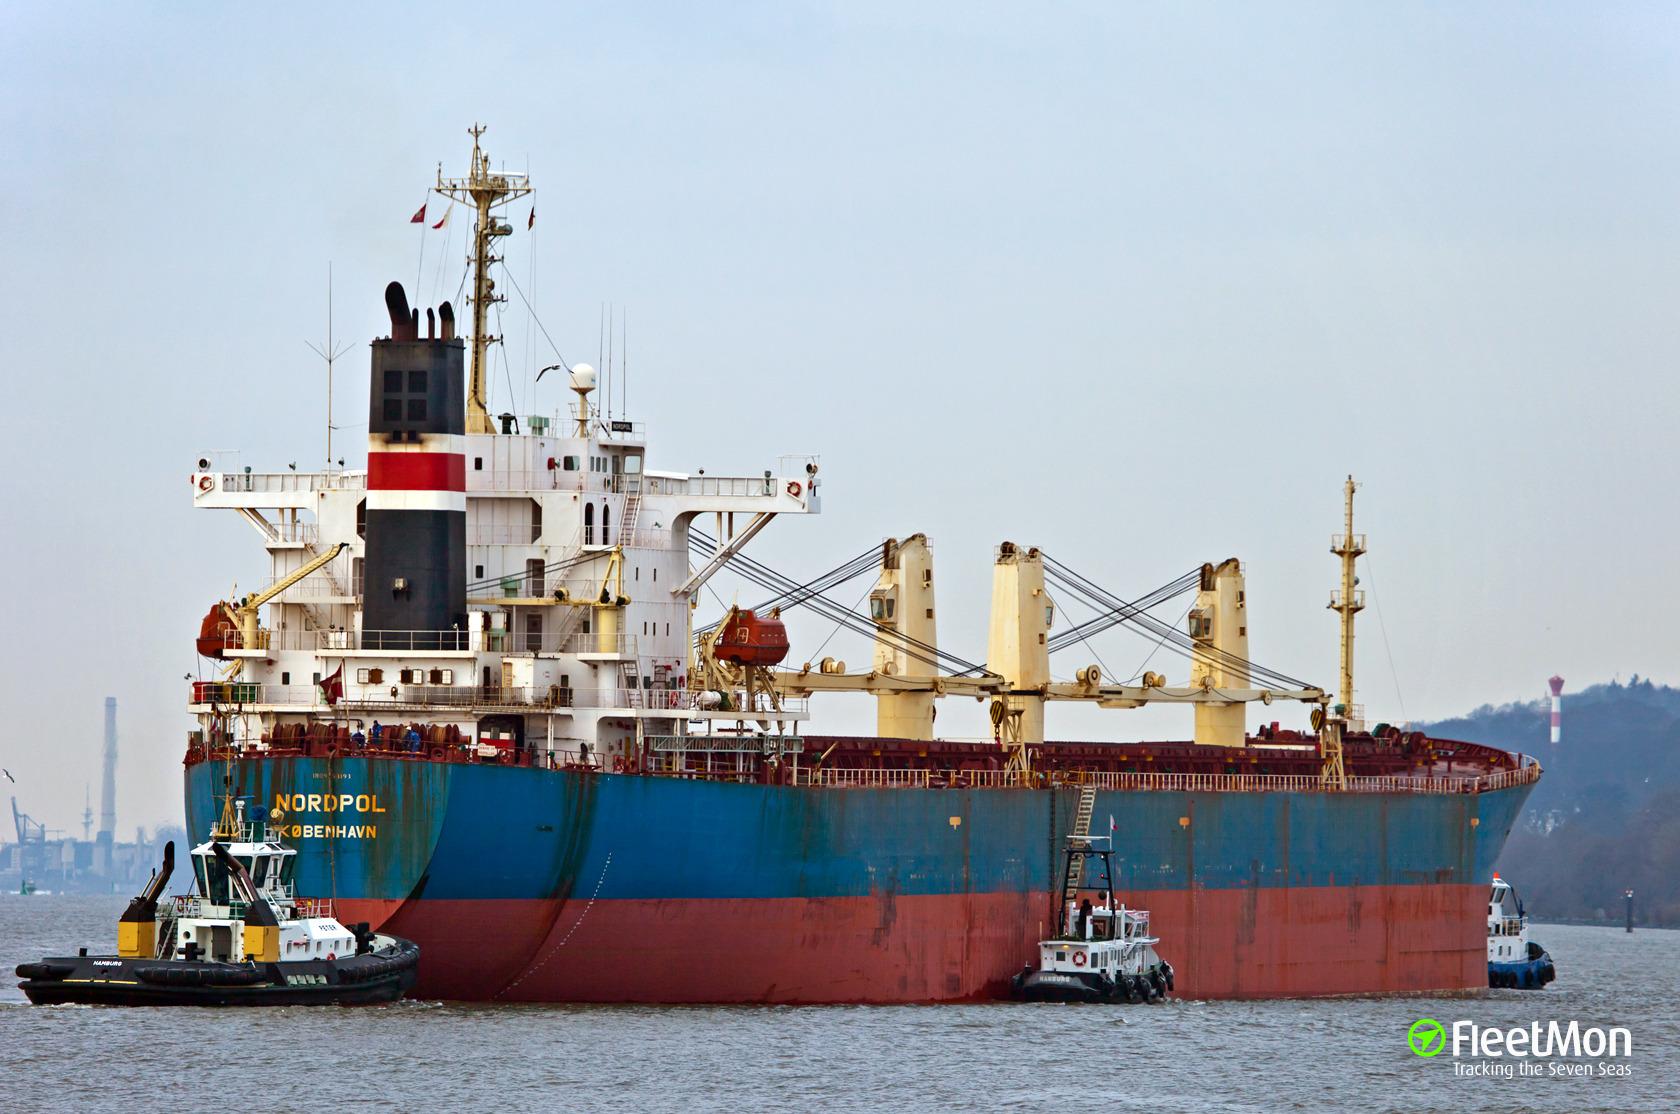 Danish bulk carrier Nordpol called Halifax with damaged propeller